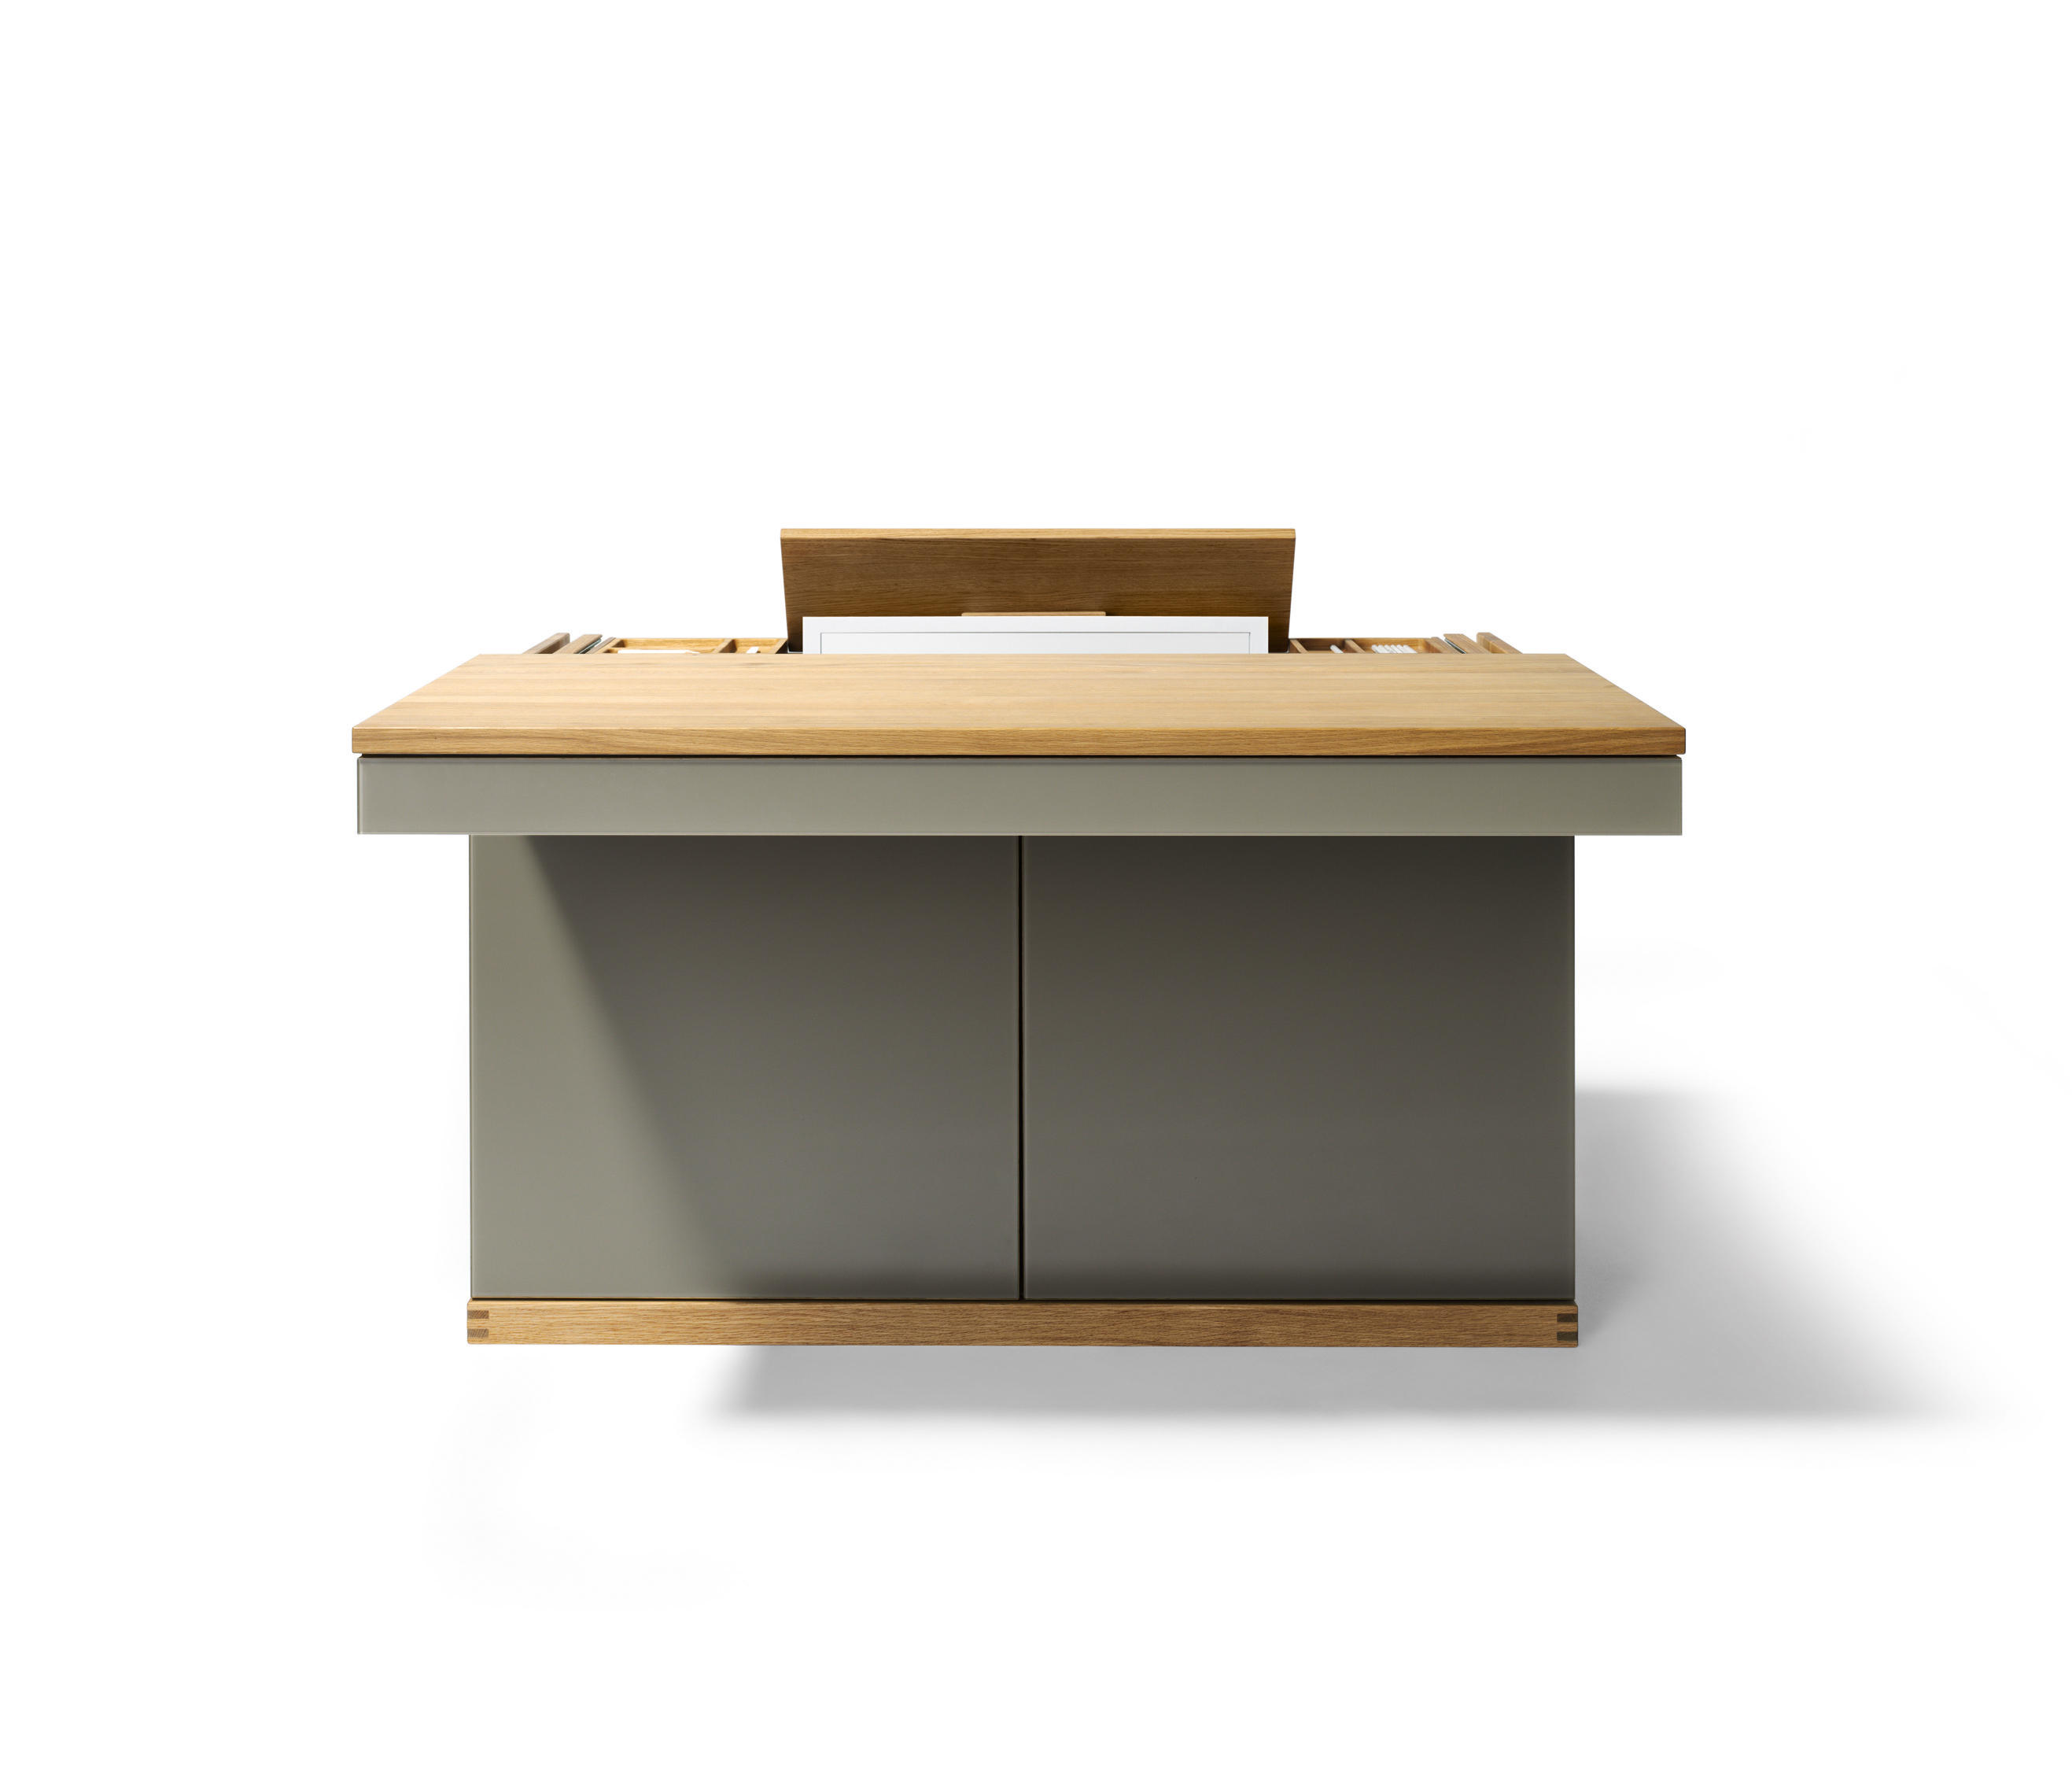 cubus secr taire secr taires de team 7 architonic. Black Bedroom Furniture Sets. Home Design Ideas